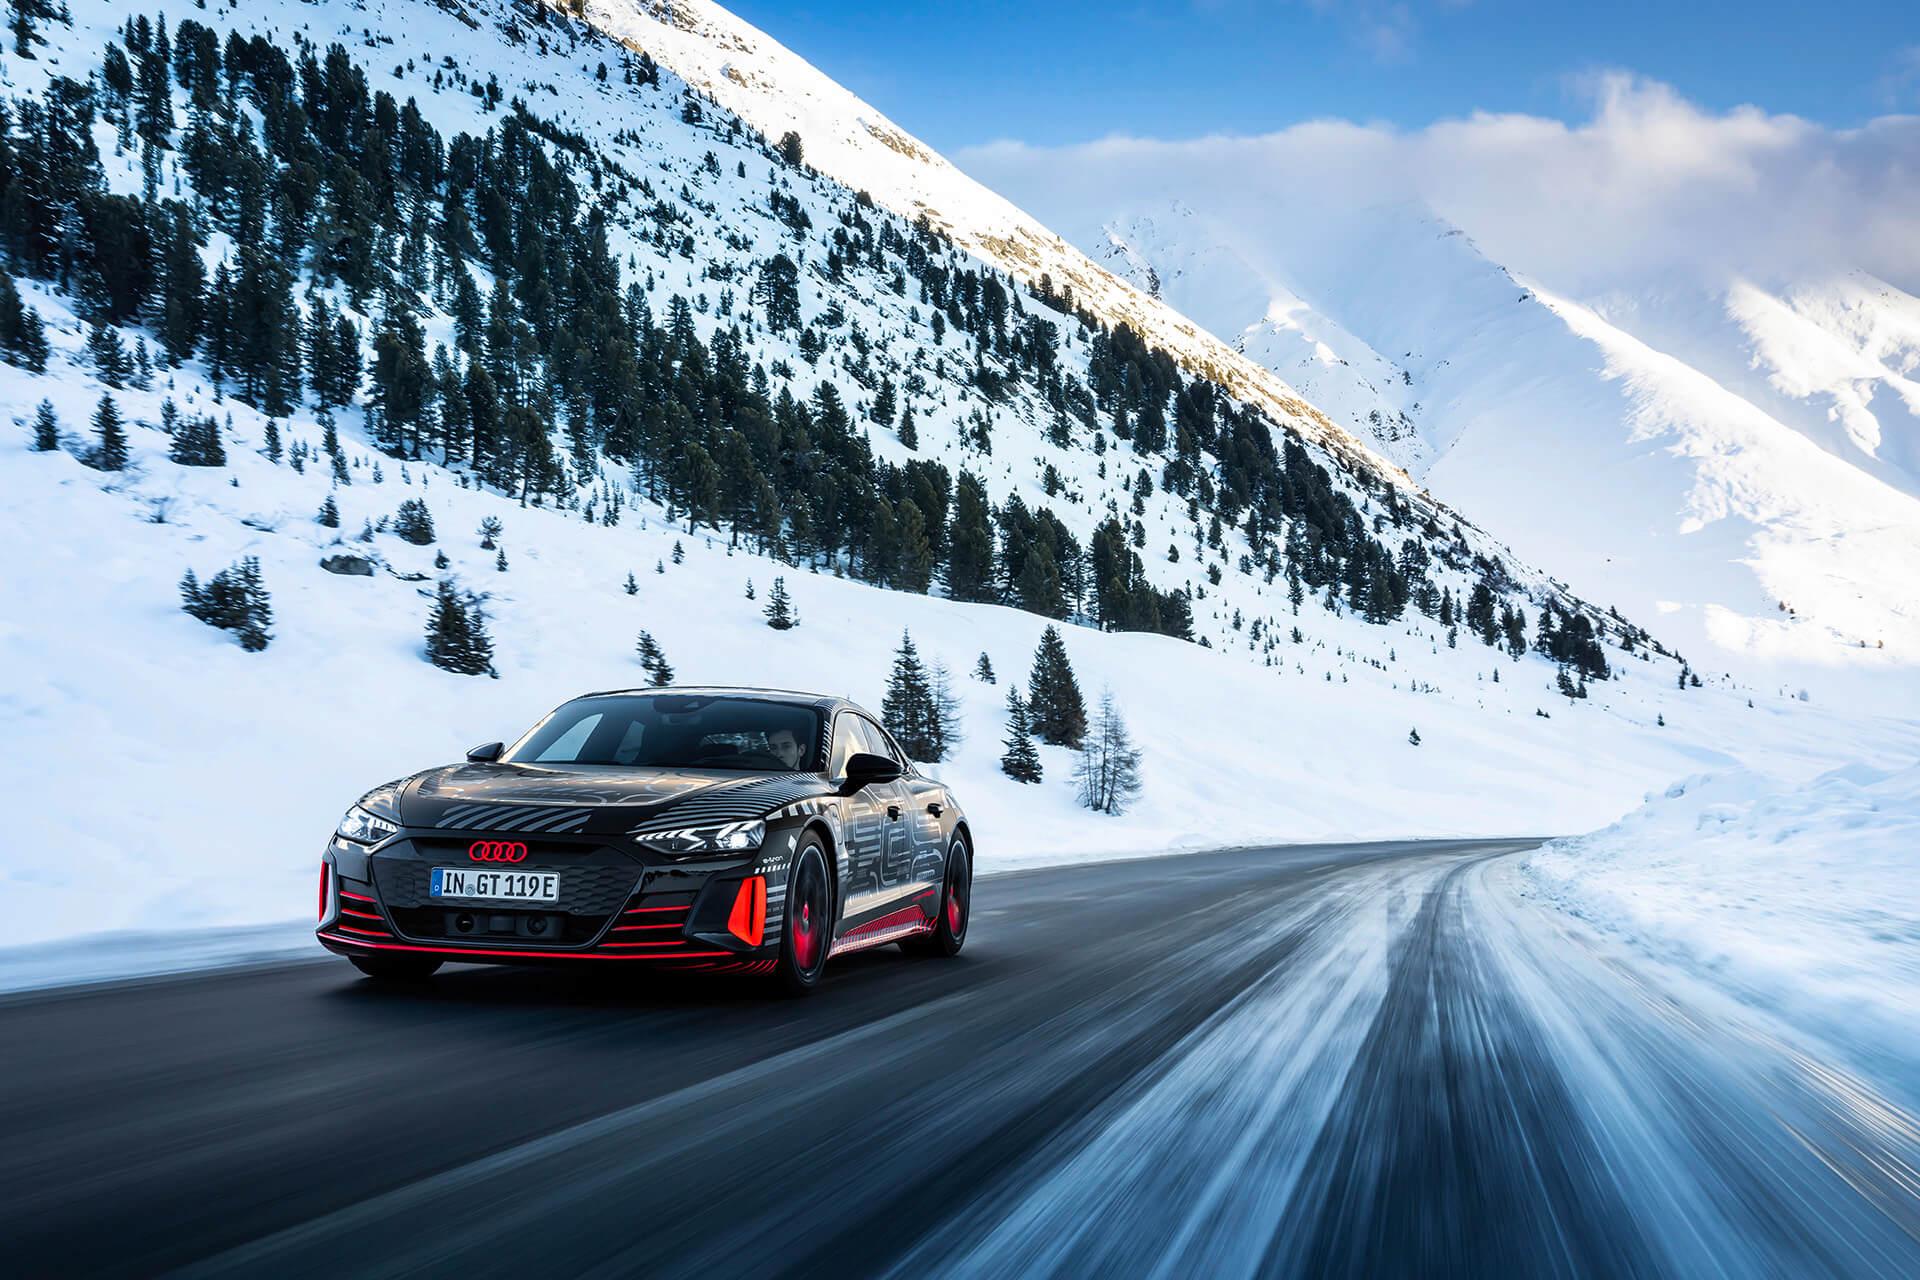 Audi e-tron GT εν κινήσει σε χιονισμένο τοπίο